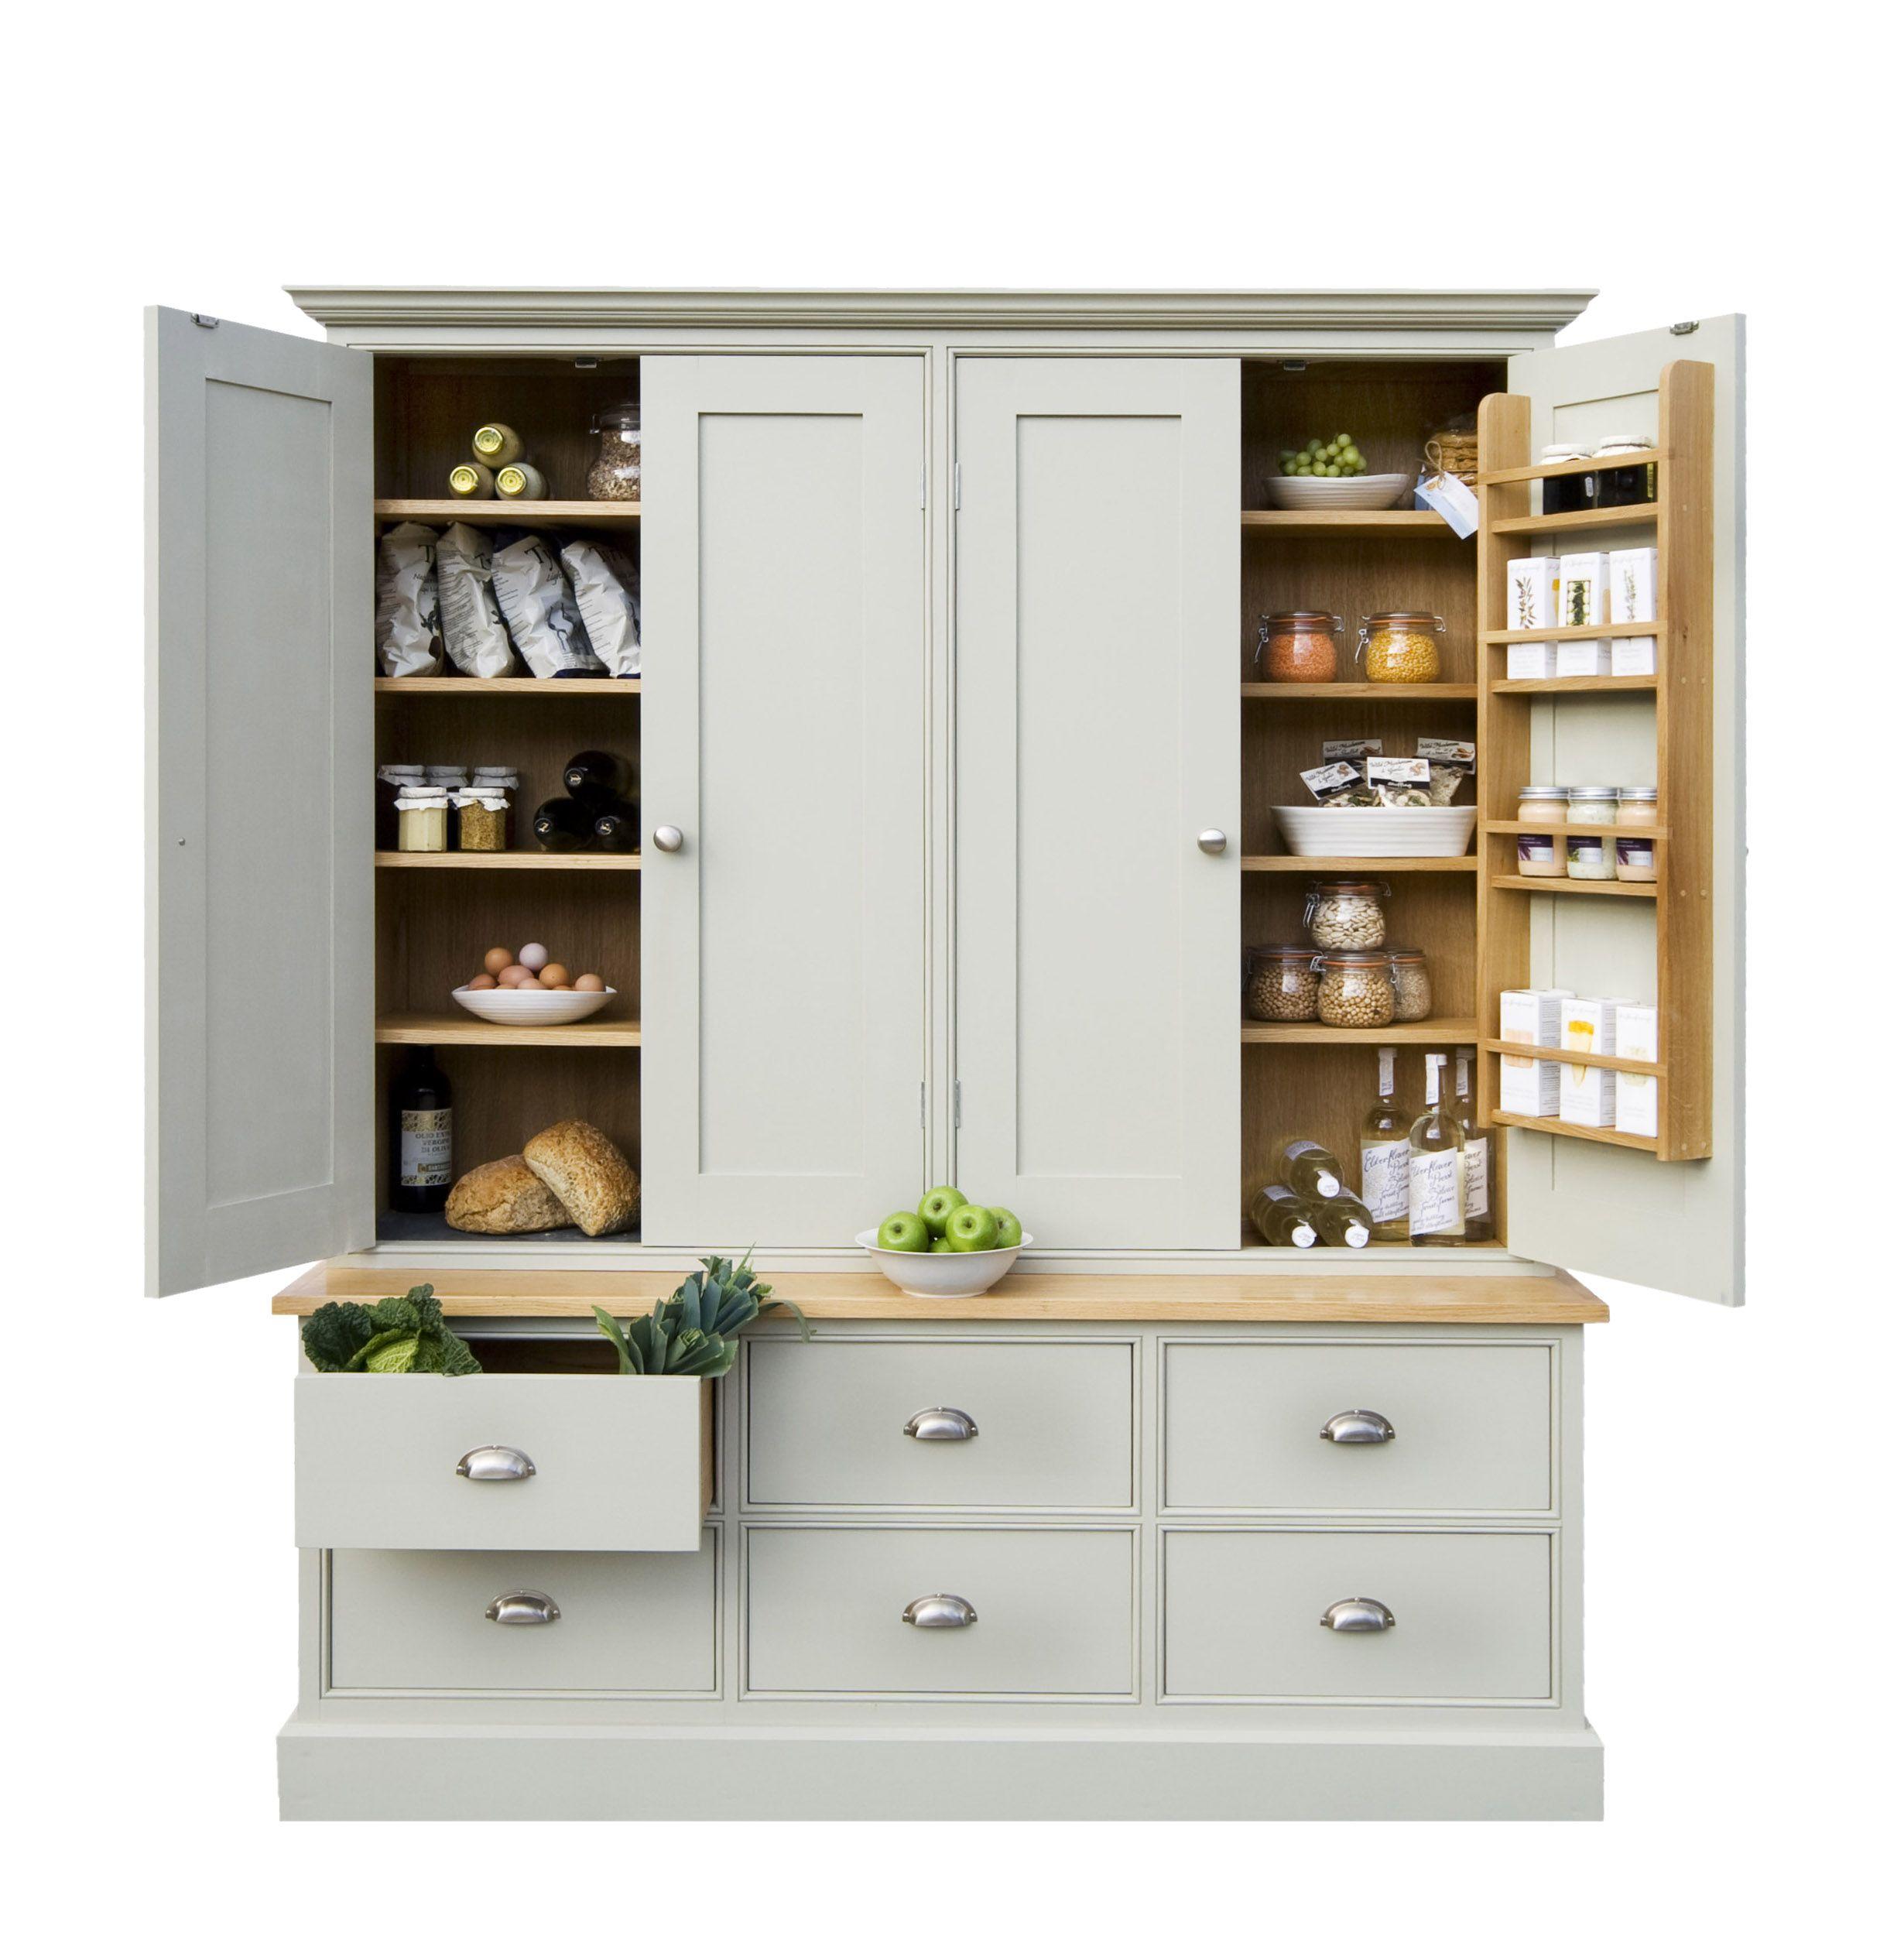 Larder Cupboard Simple Lines But Ultimate Storage